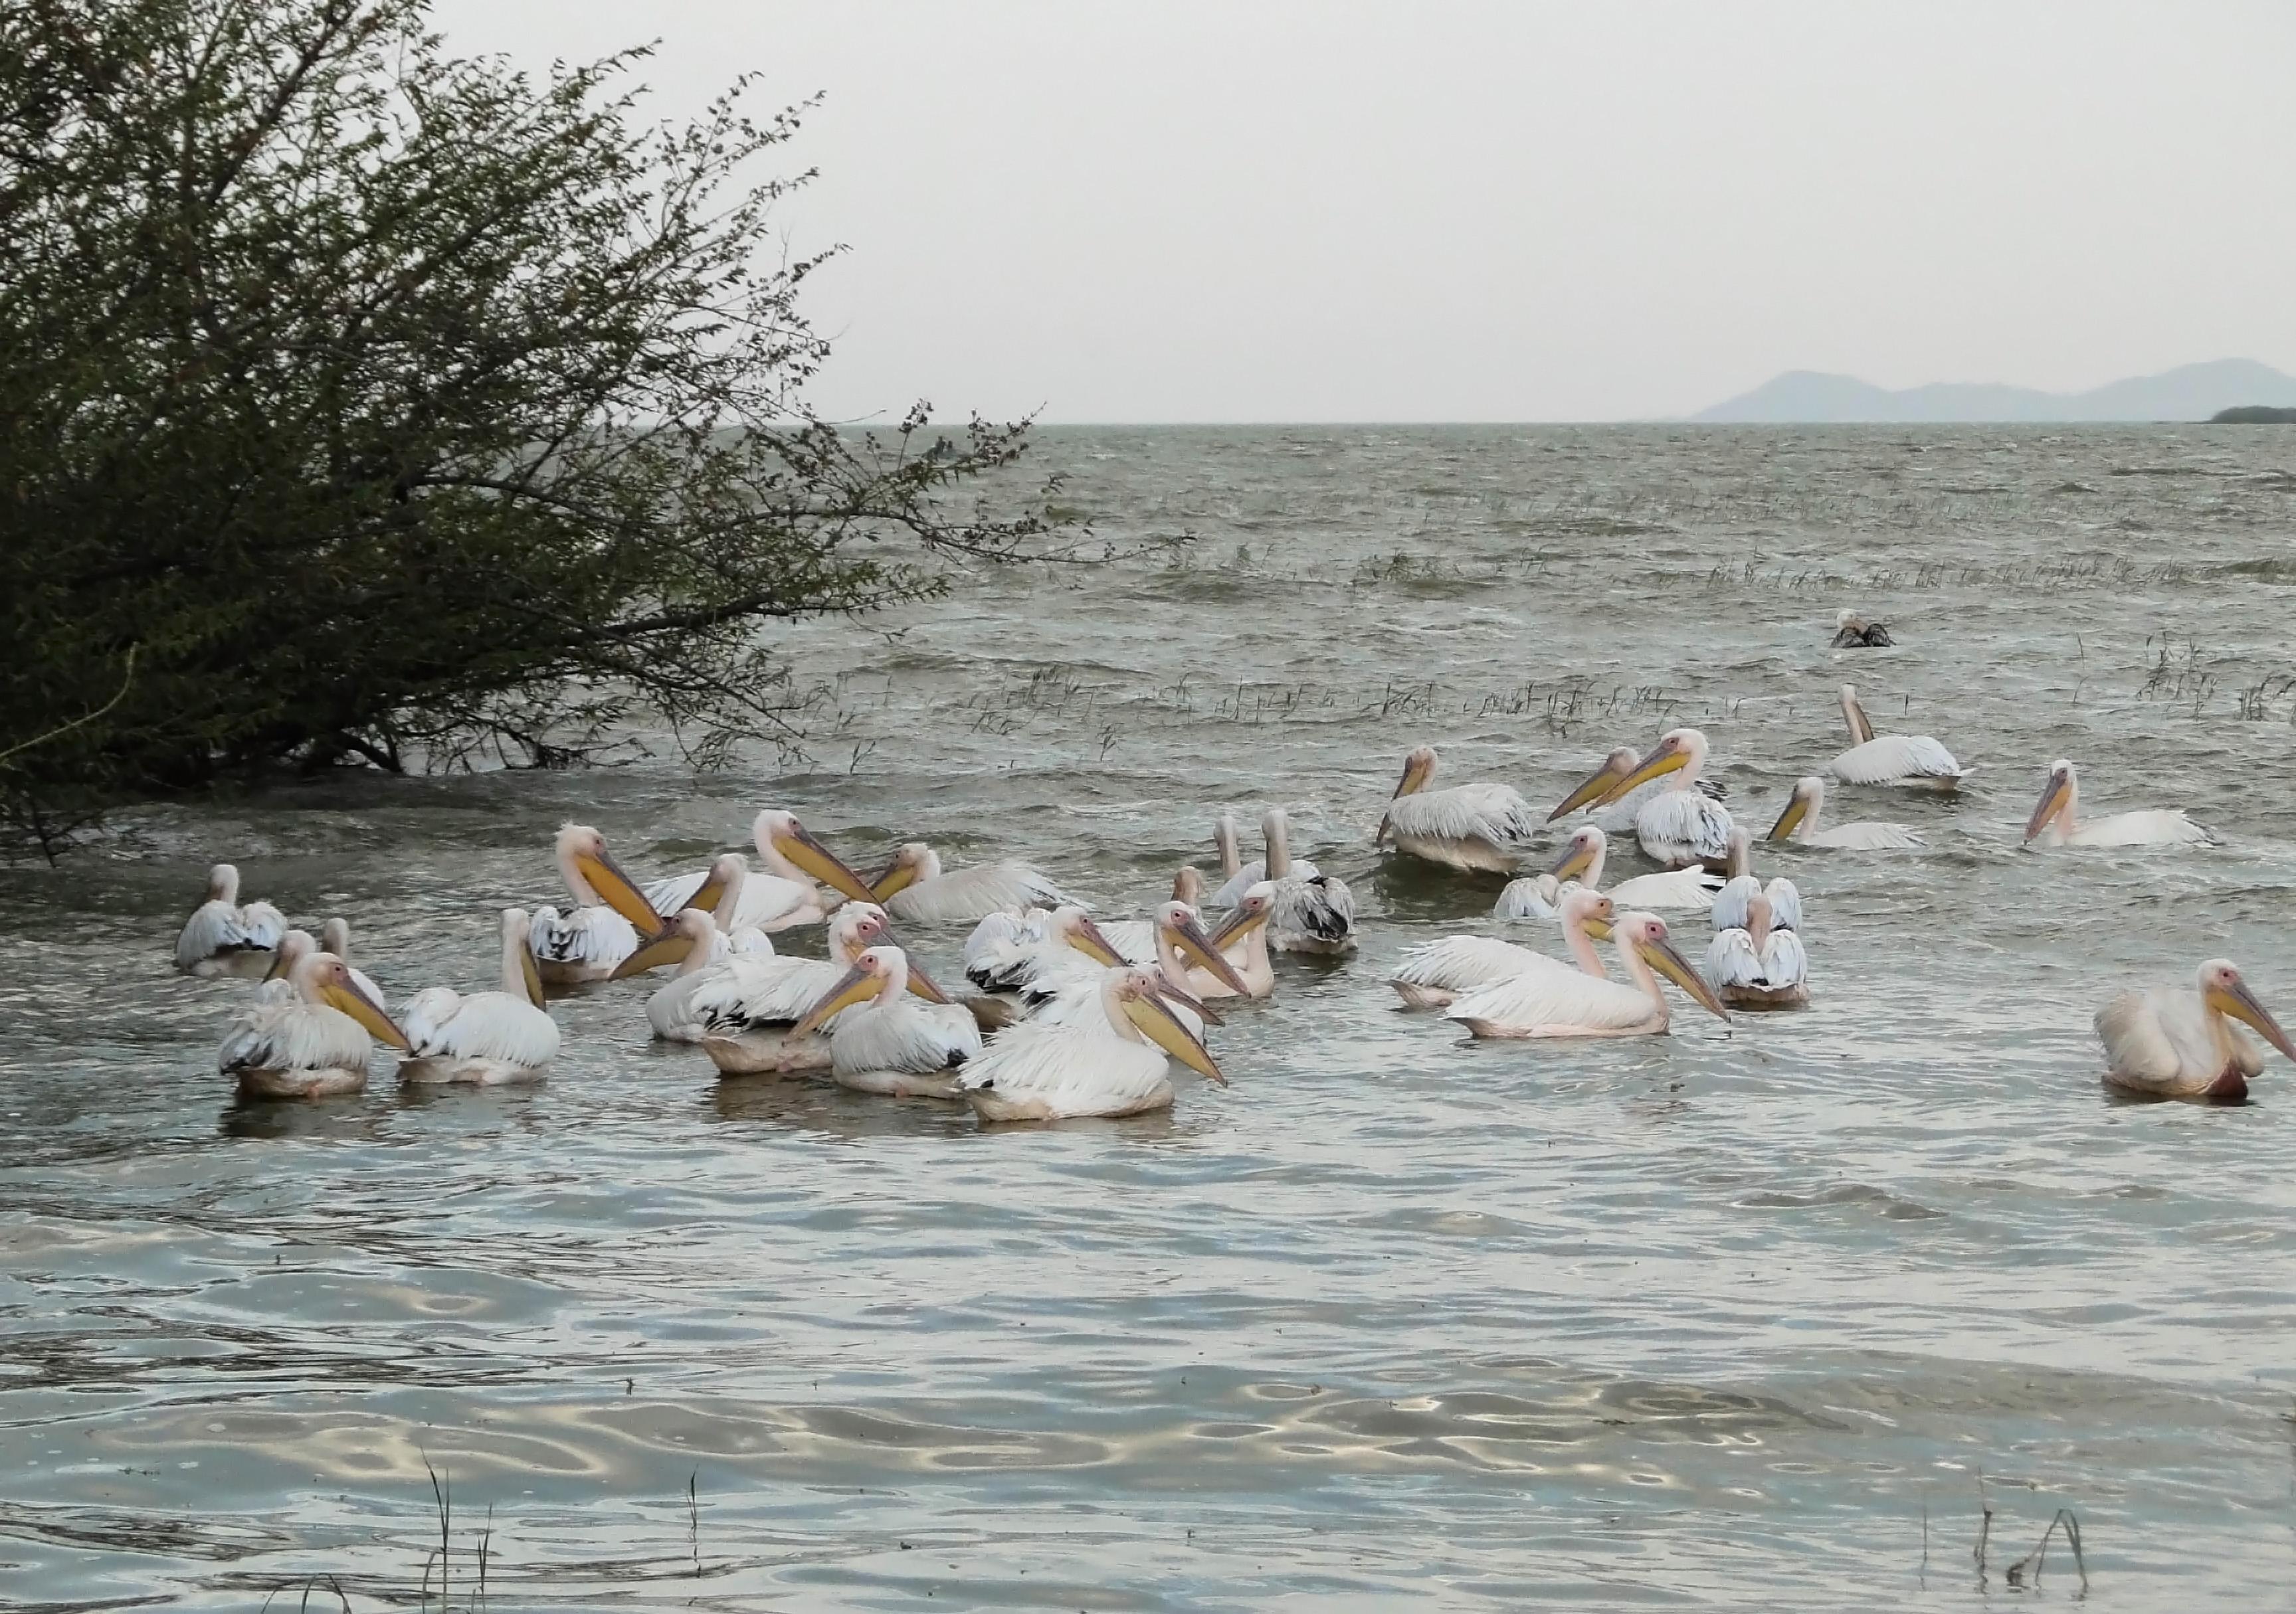 Lake Ziway - theonearmedcrab.com